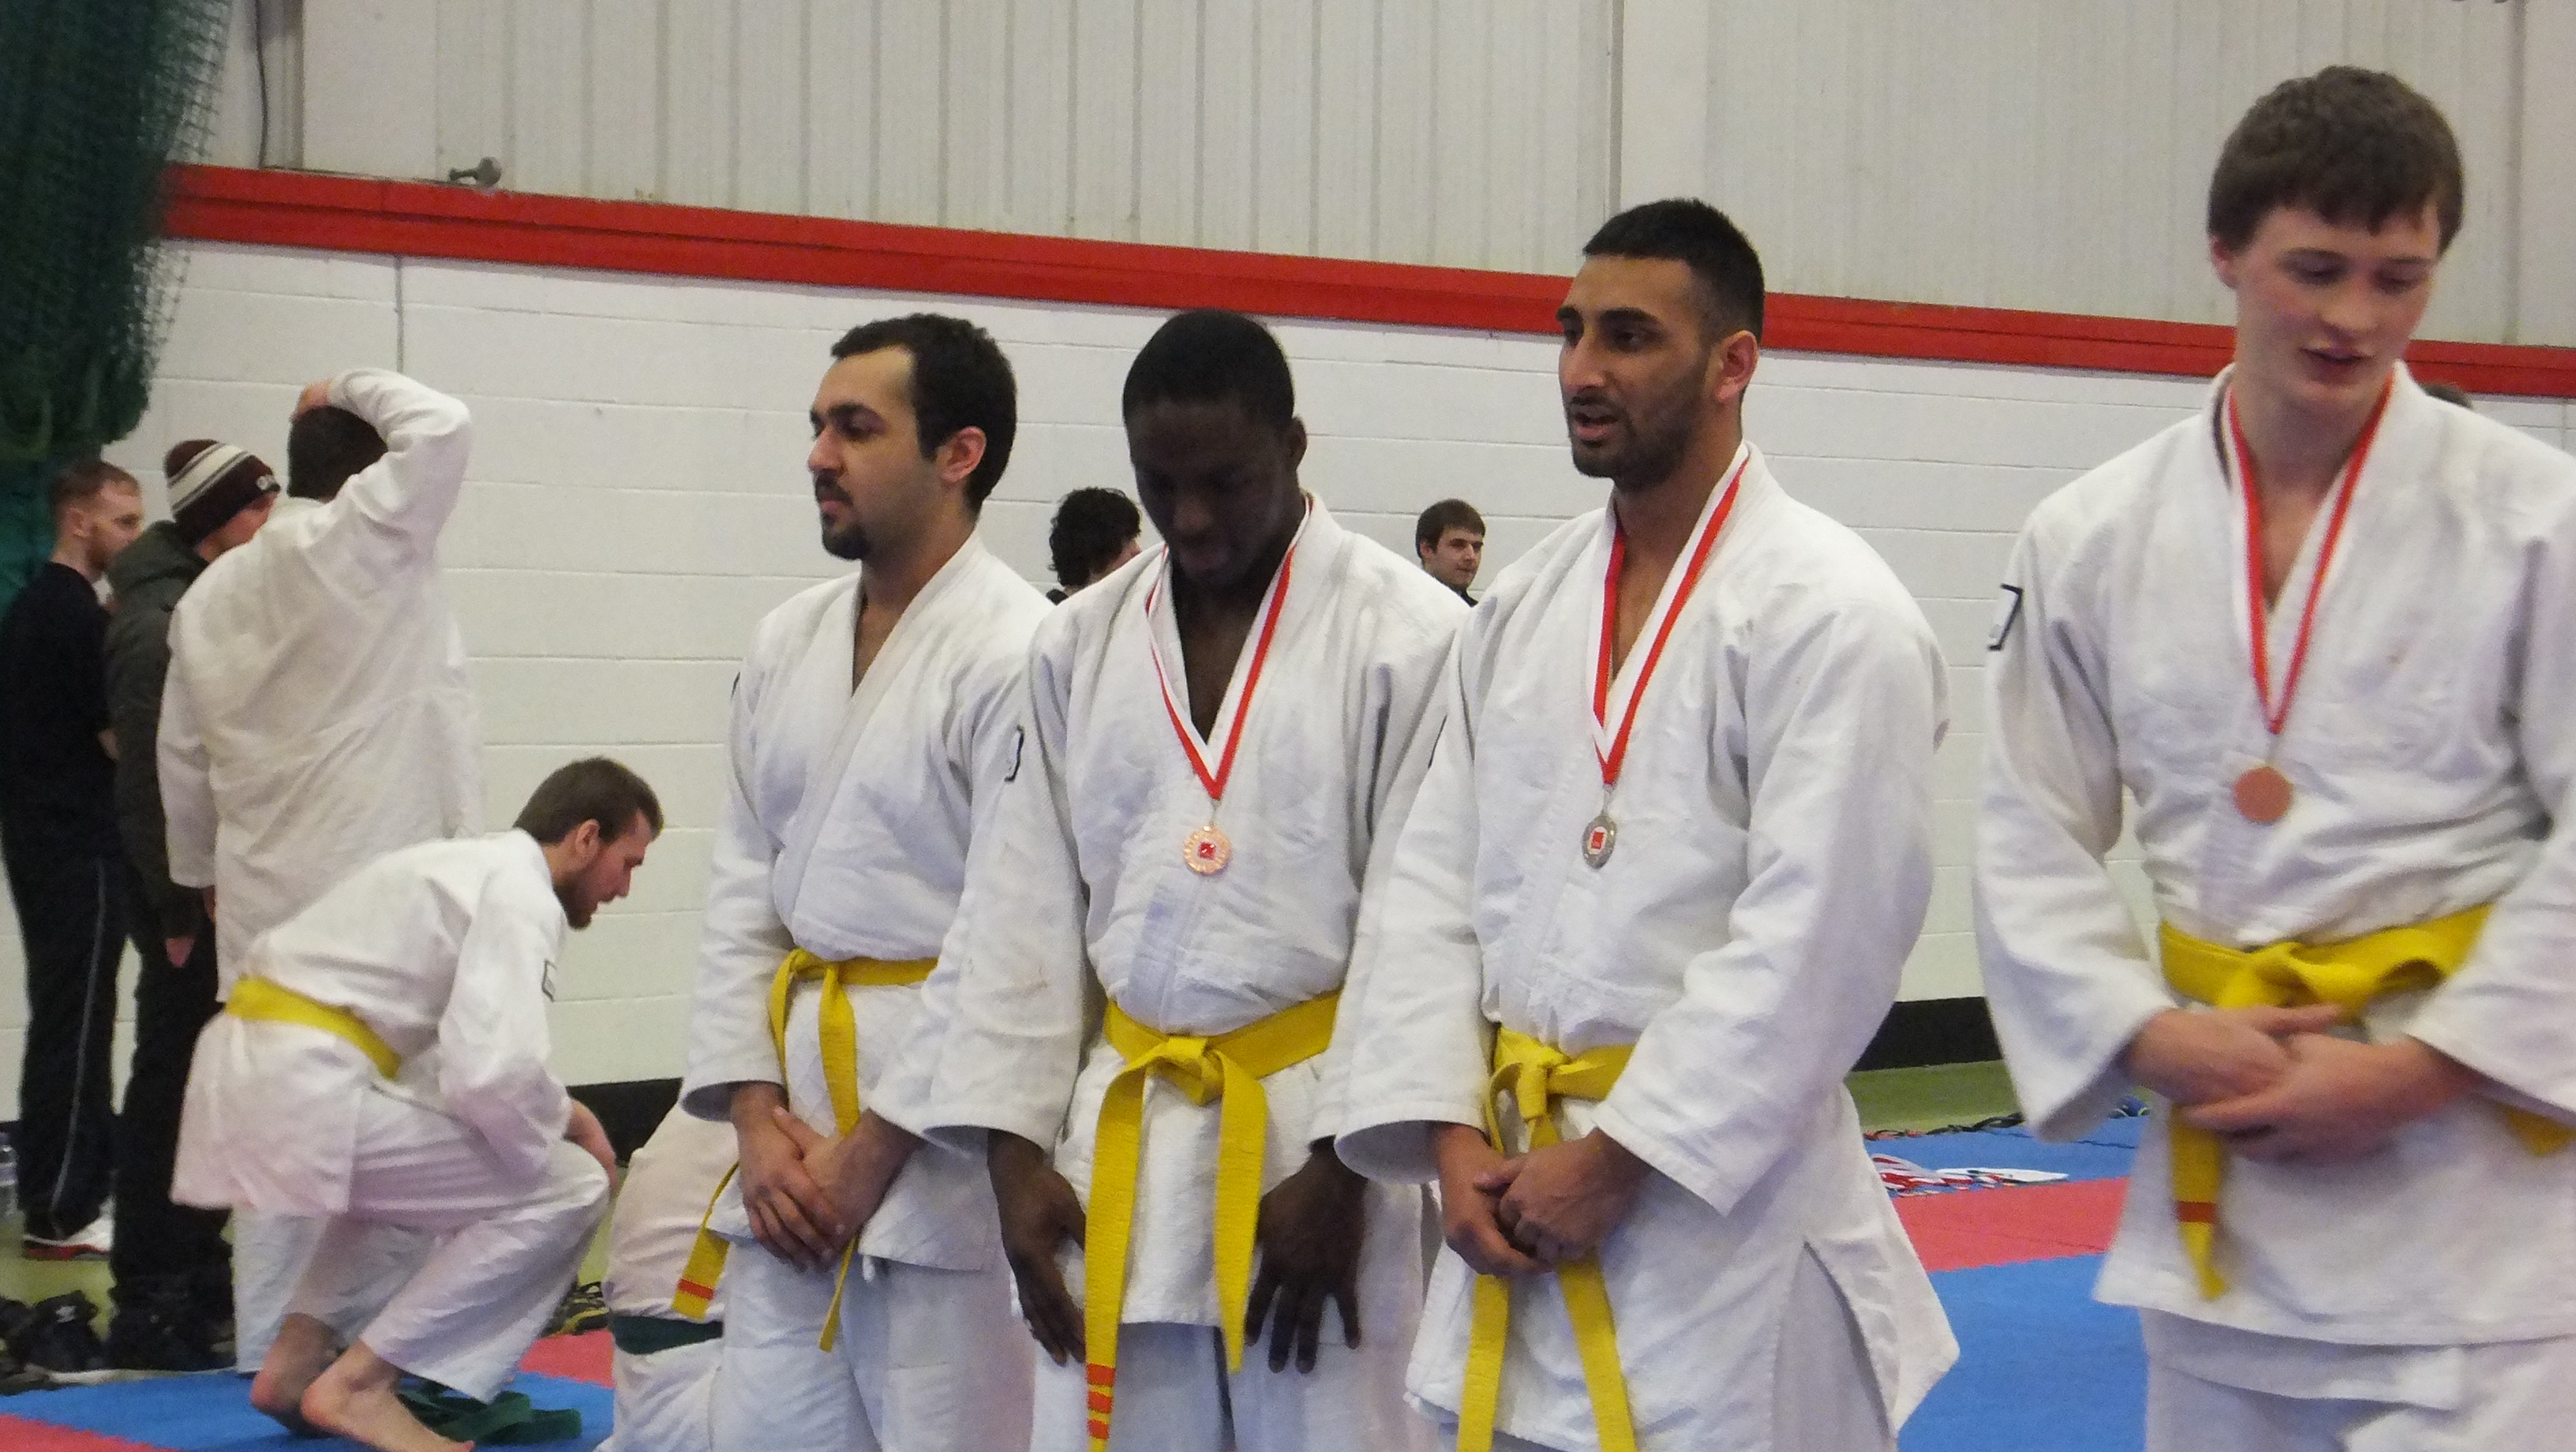 Eddy wins bronze